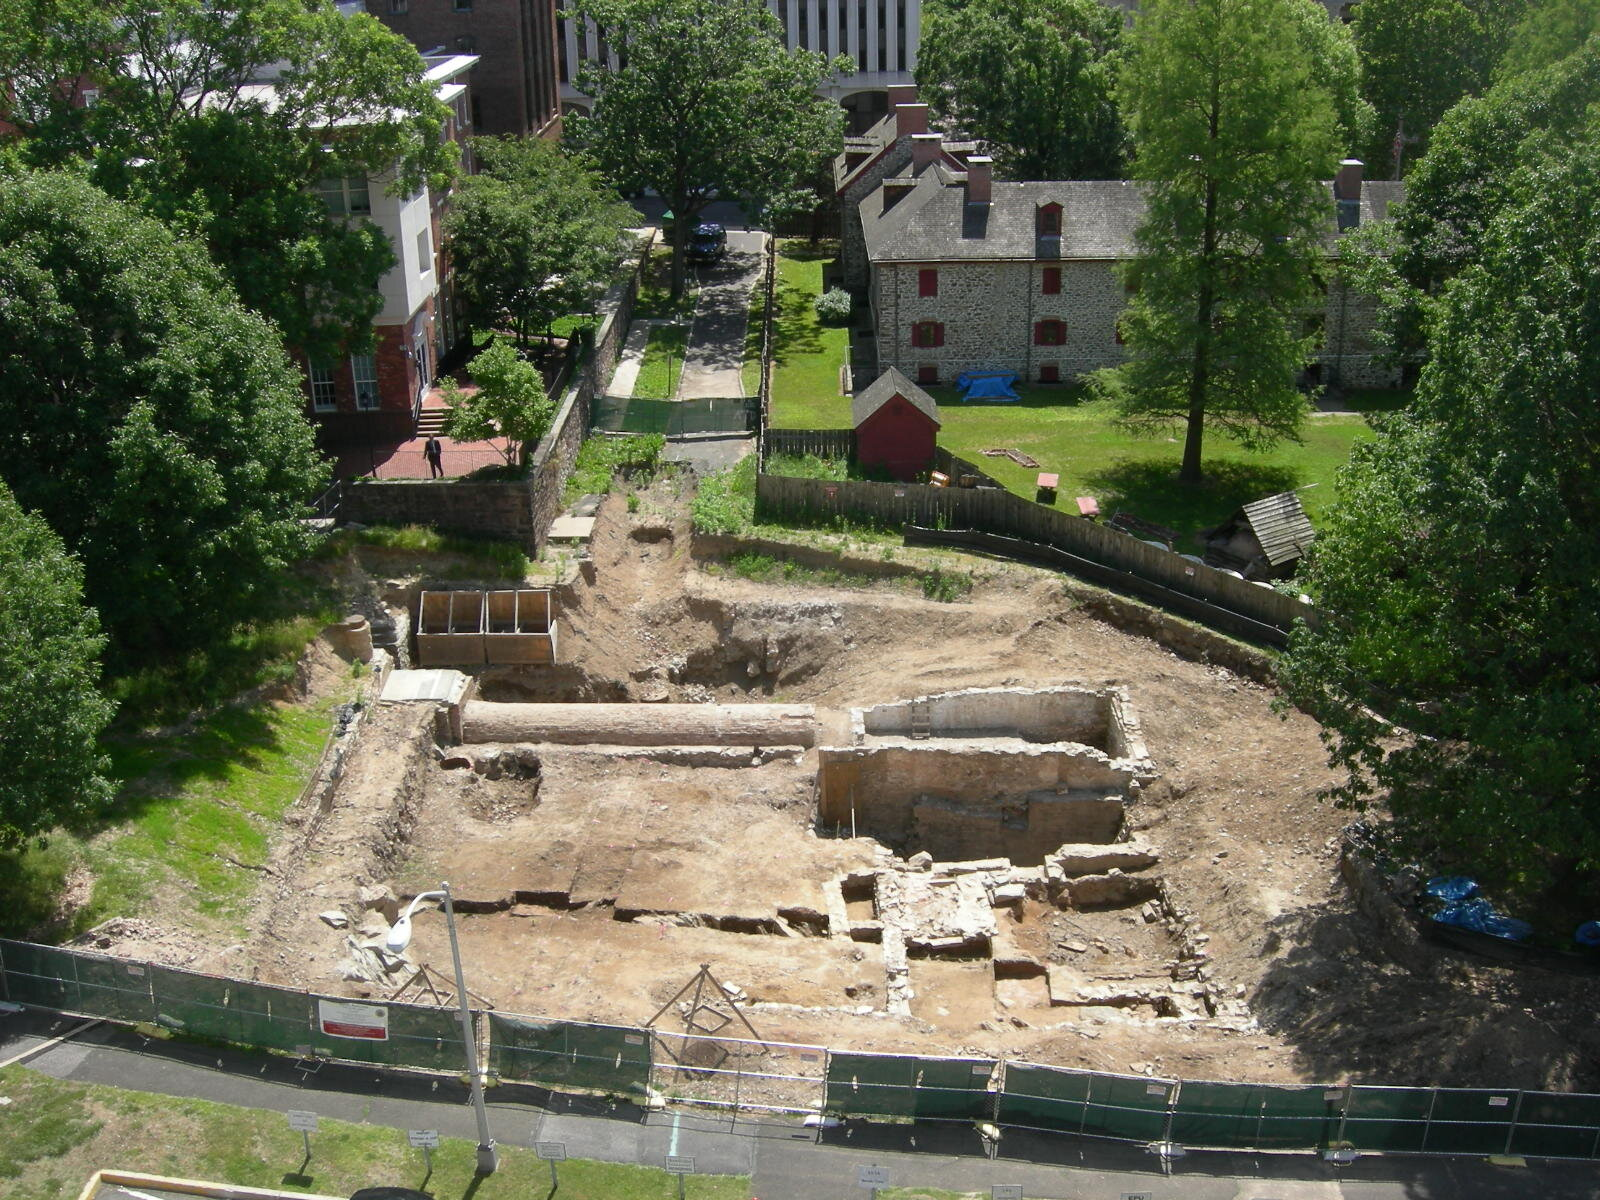 Petty's Run mid-excavation 2009